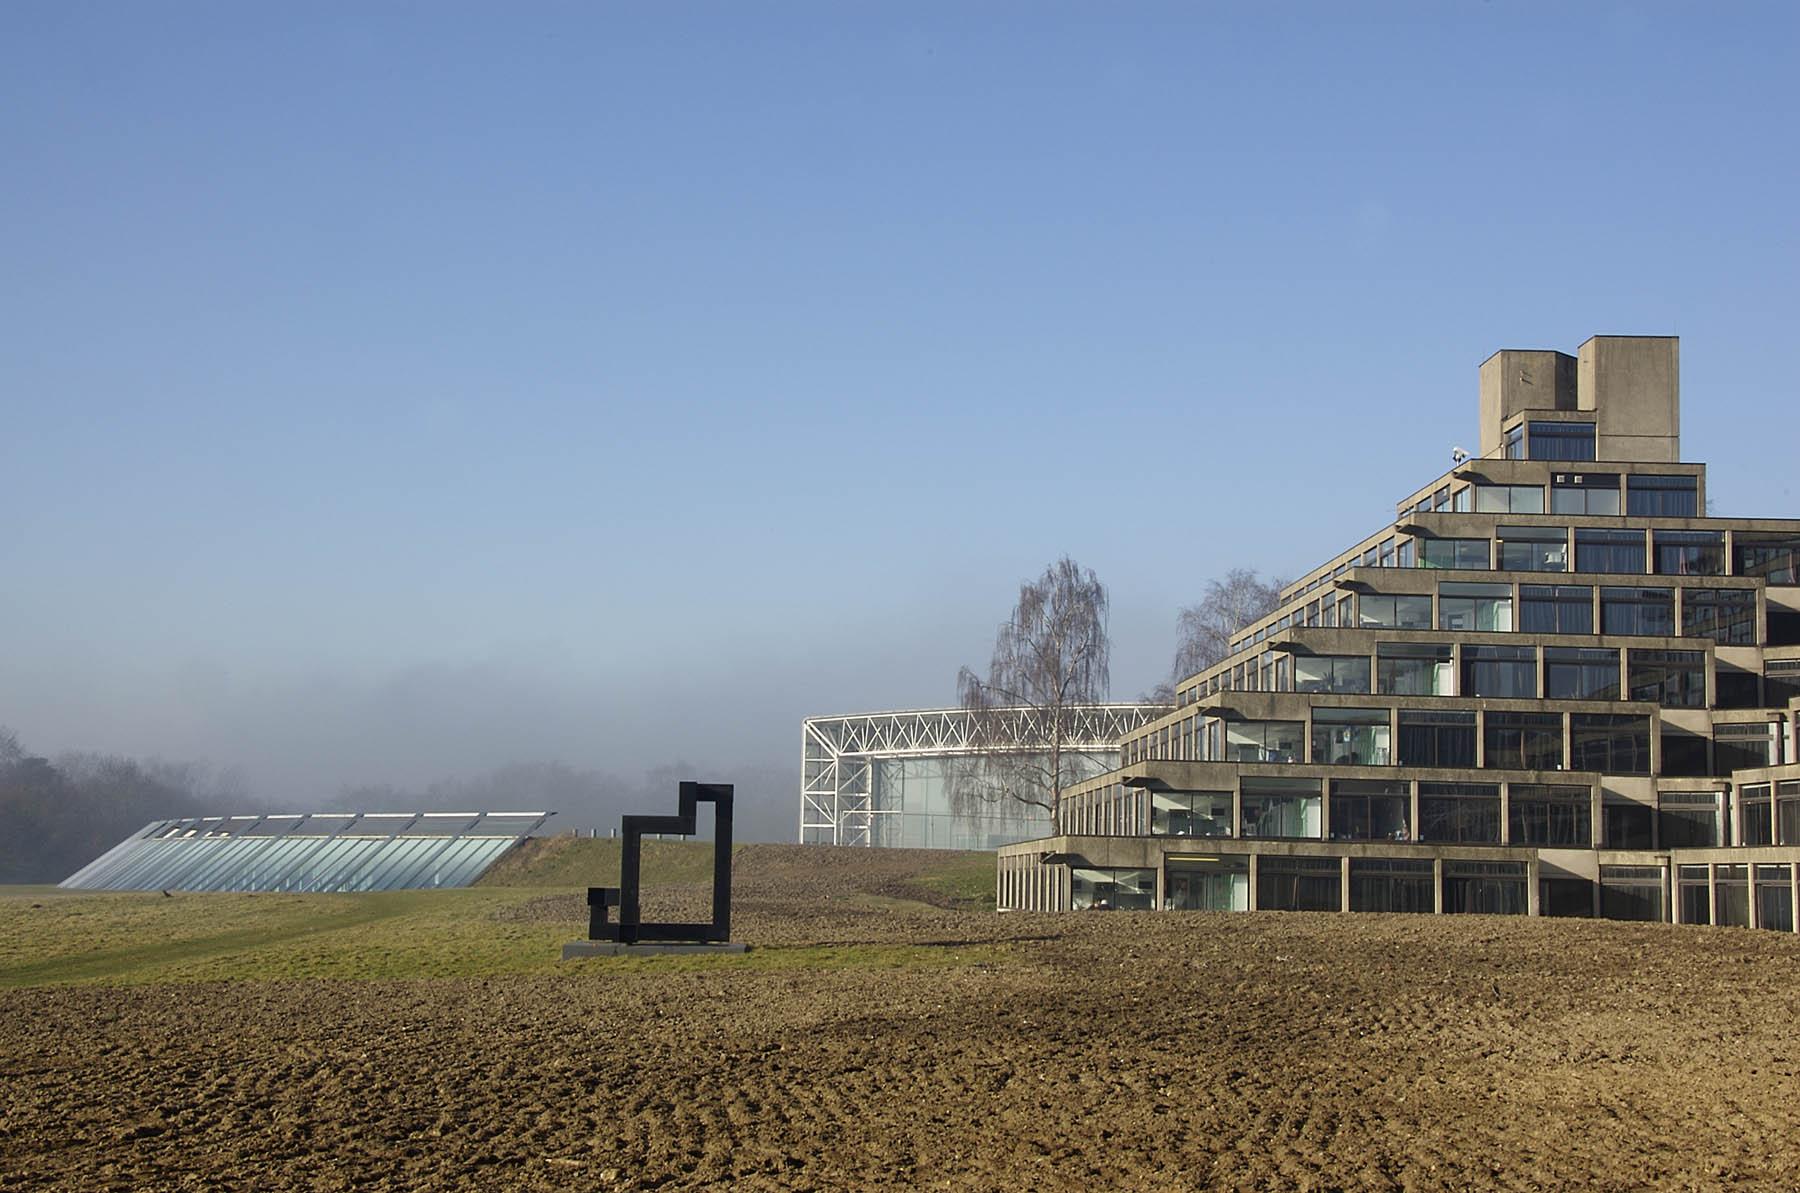 Proximity, Ian Tyson, UEA, Norwich. Photo: mira66